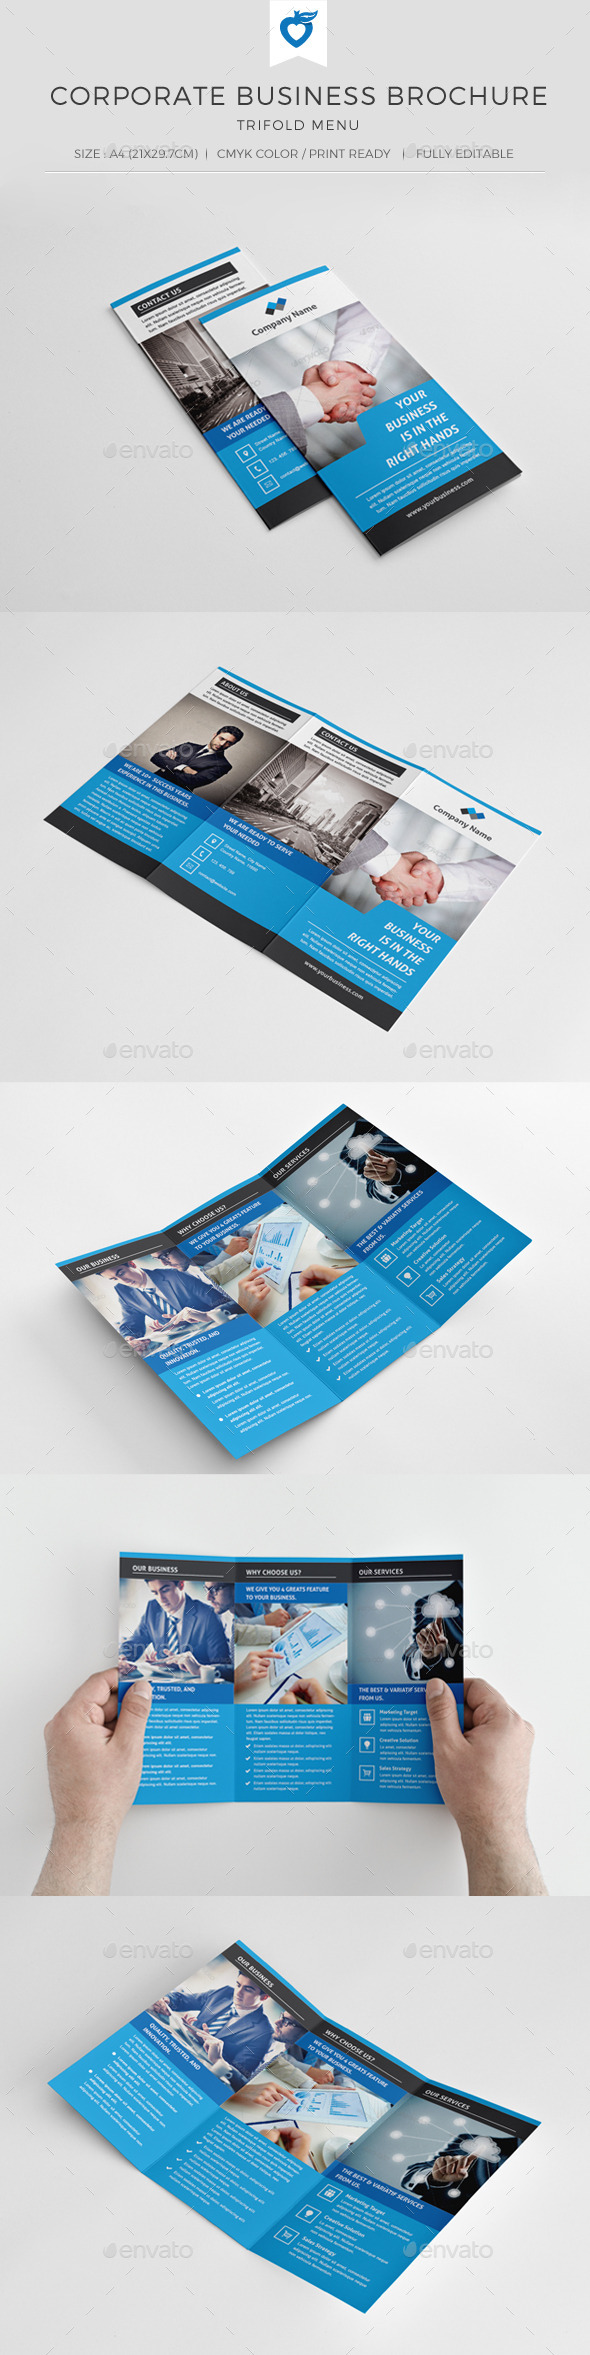 GraphicRiver Corporate Business Trifold Brochure 10307531